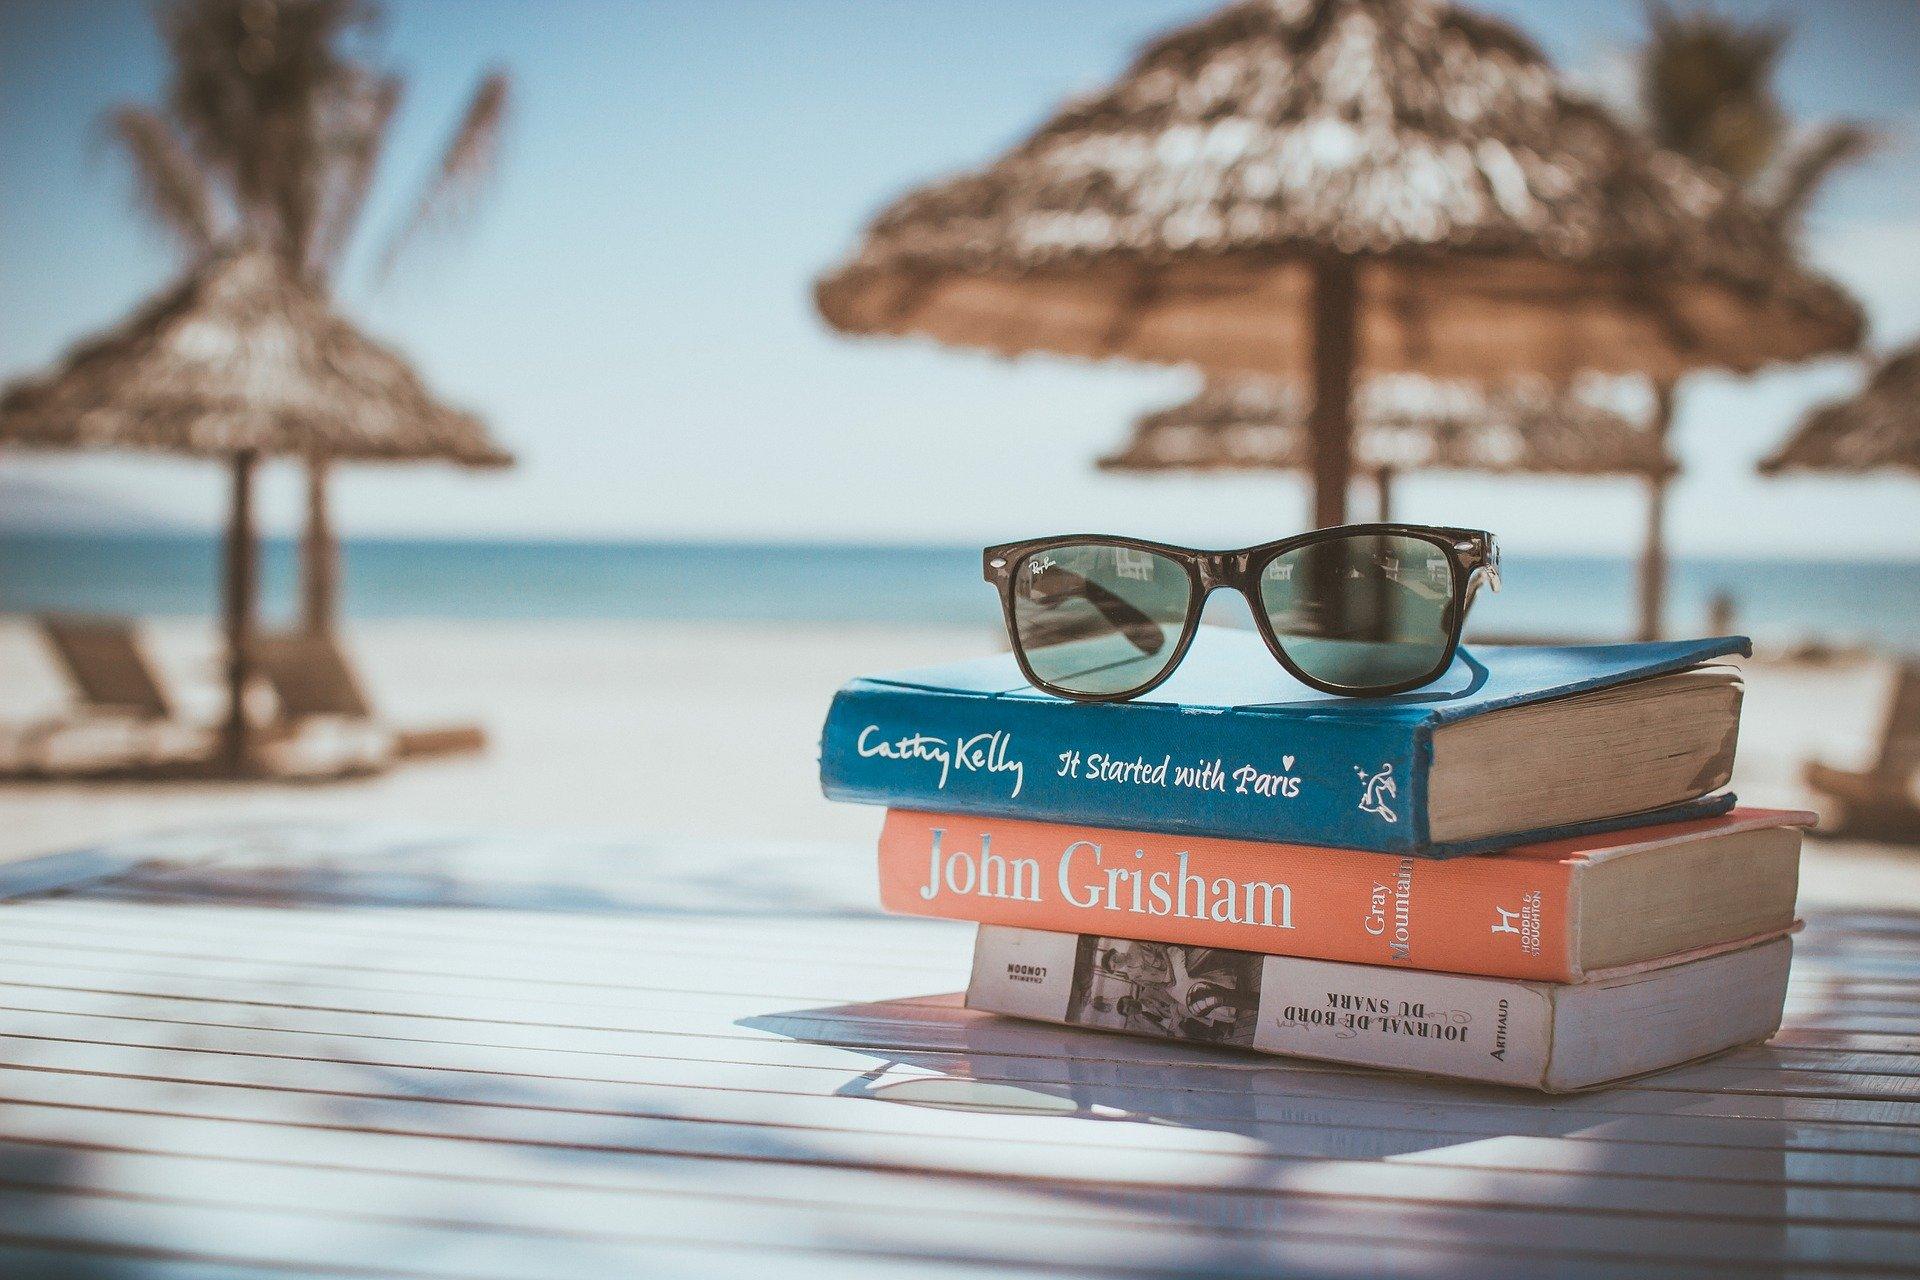 Urlaubsanträge zu Jahresbeginn